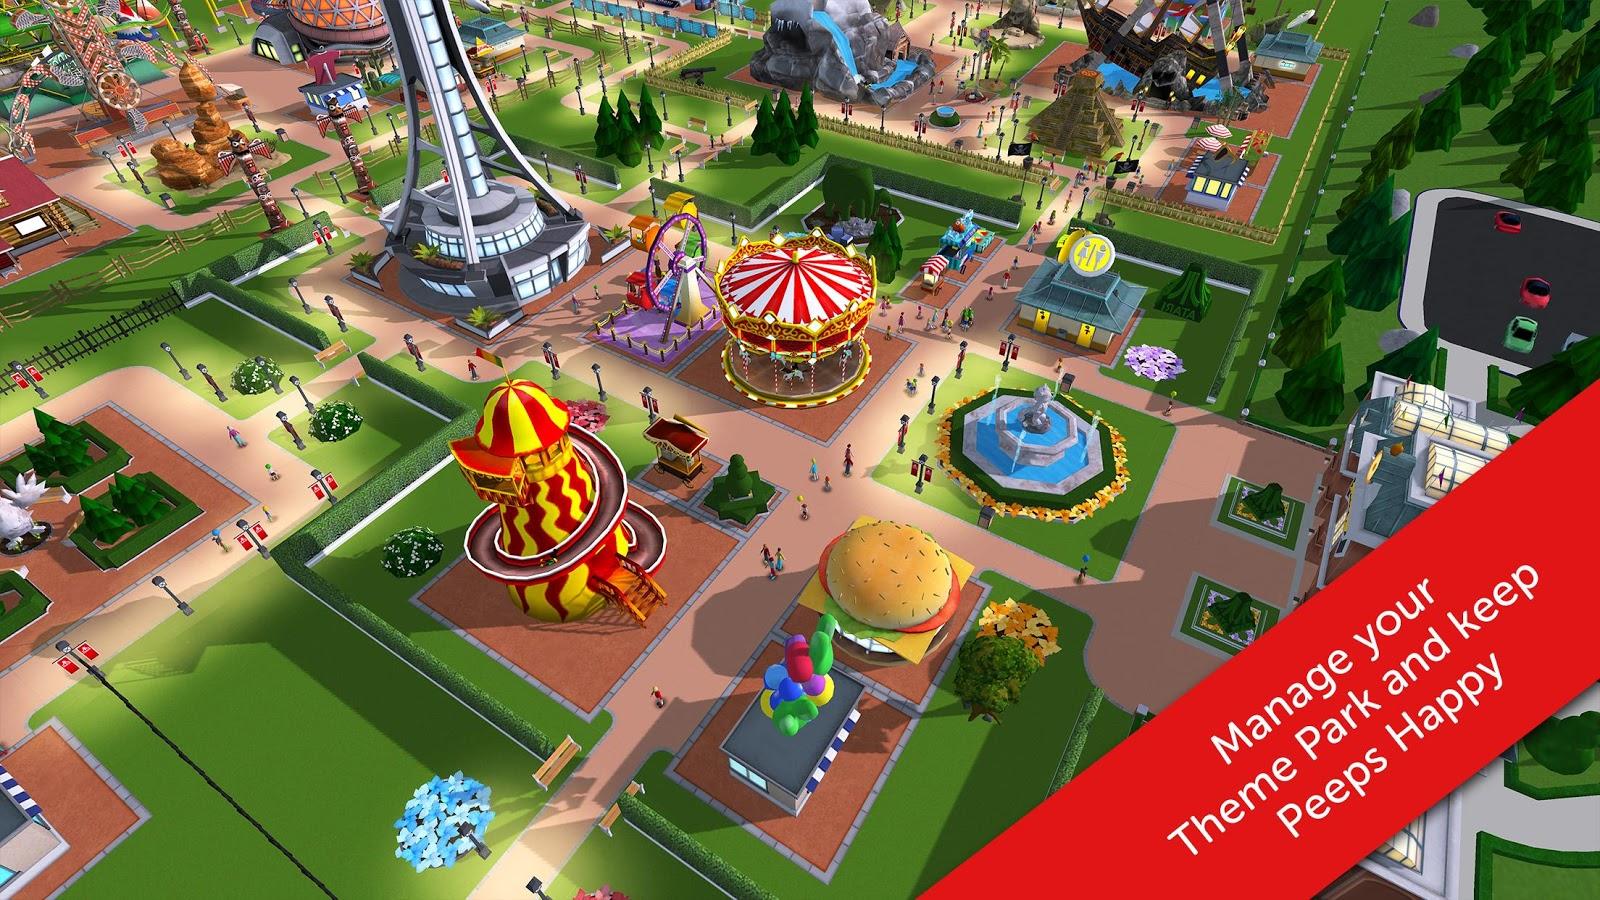 142) Download Game RollerCoaster Tycoon Touch Mod Apk Data ~ NGOOOPREK